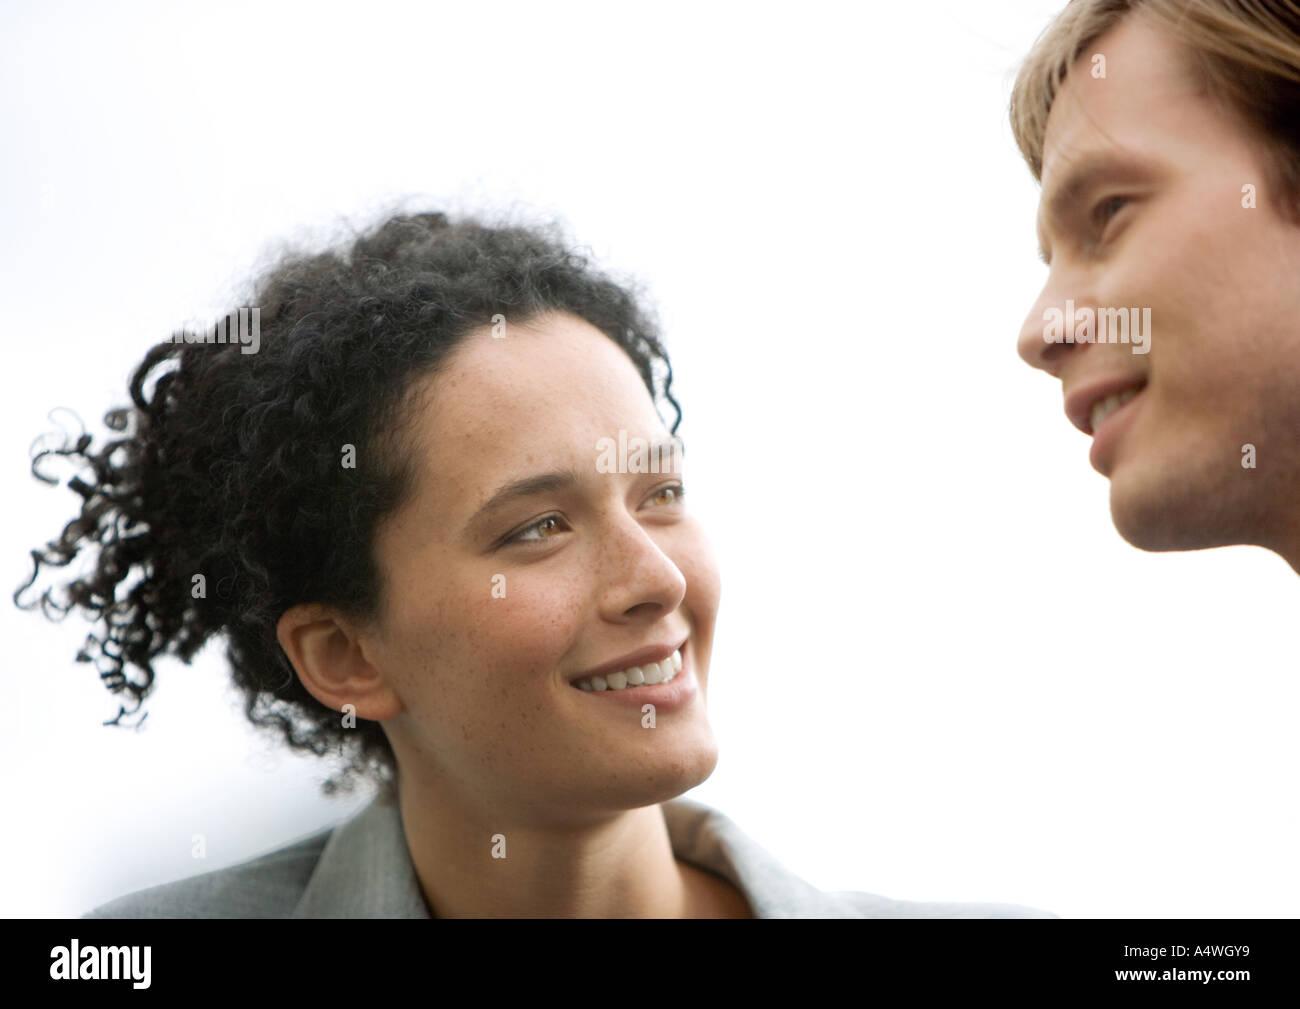 Woman and man conversing - Stock Image